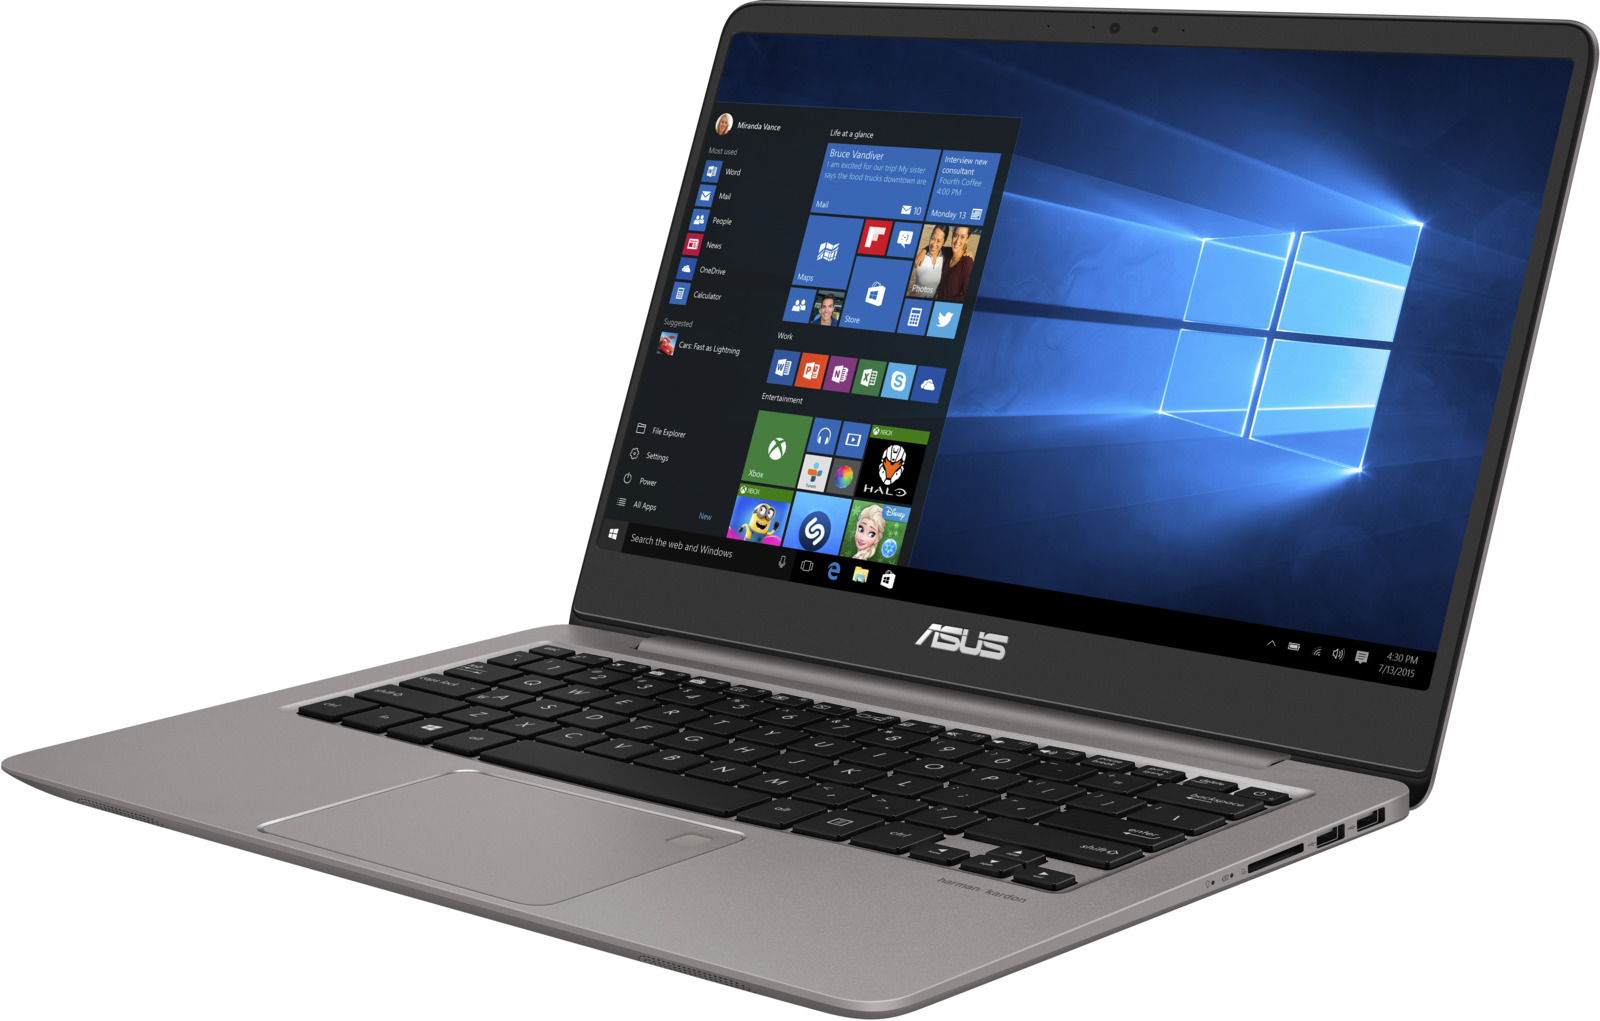 14 Ноутбук ASUS ZenBook UX410UA 90NB0DL3-M12850, серый ноутбук asus zenbook ux410ua gv503t 90nb0dl3 m10950